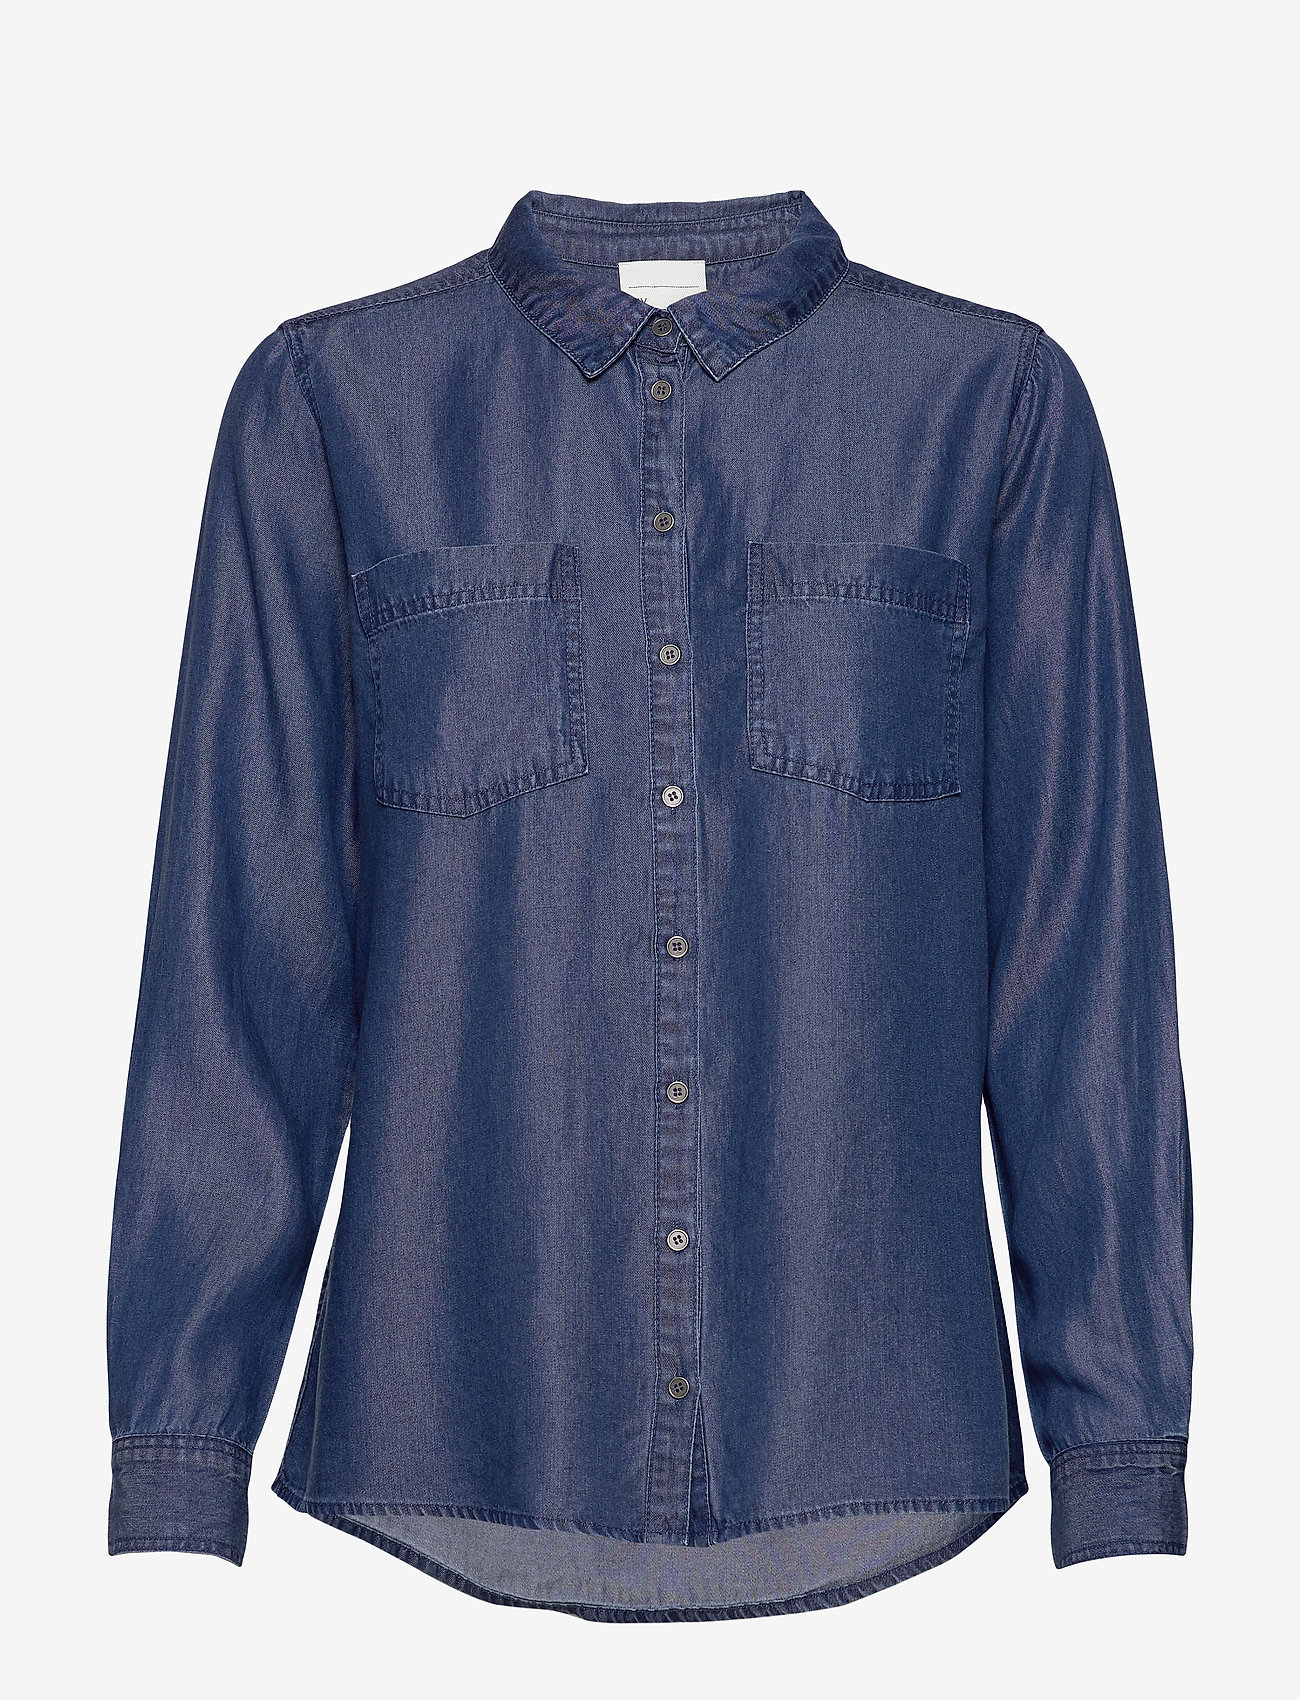 Denim Hunter - 15 THE DENIM SHIRT - jeansskjortor - denim blue - 1